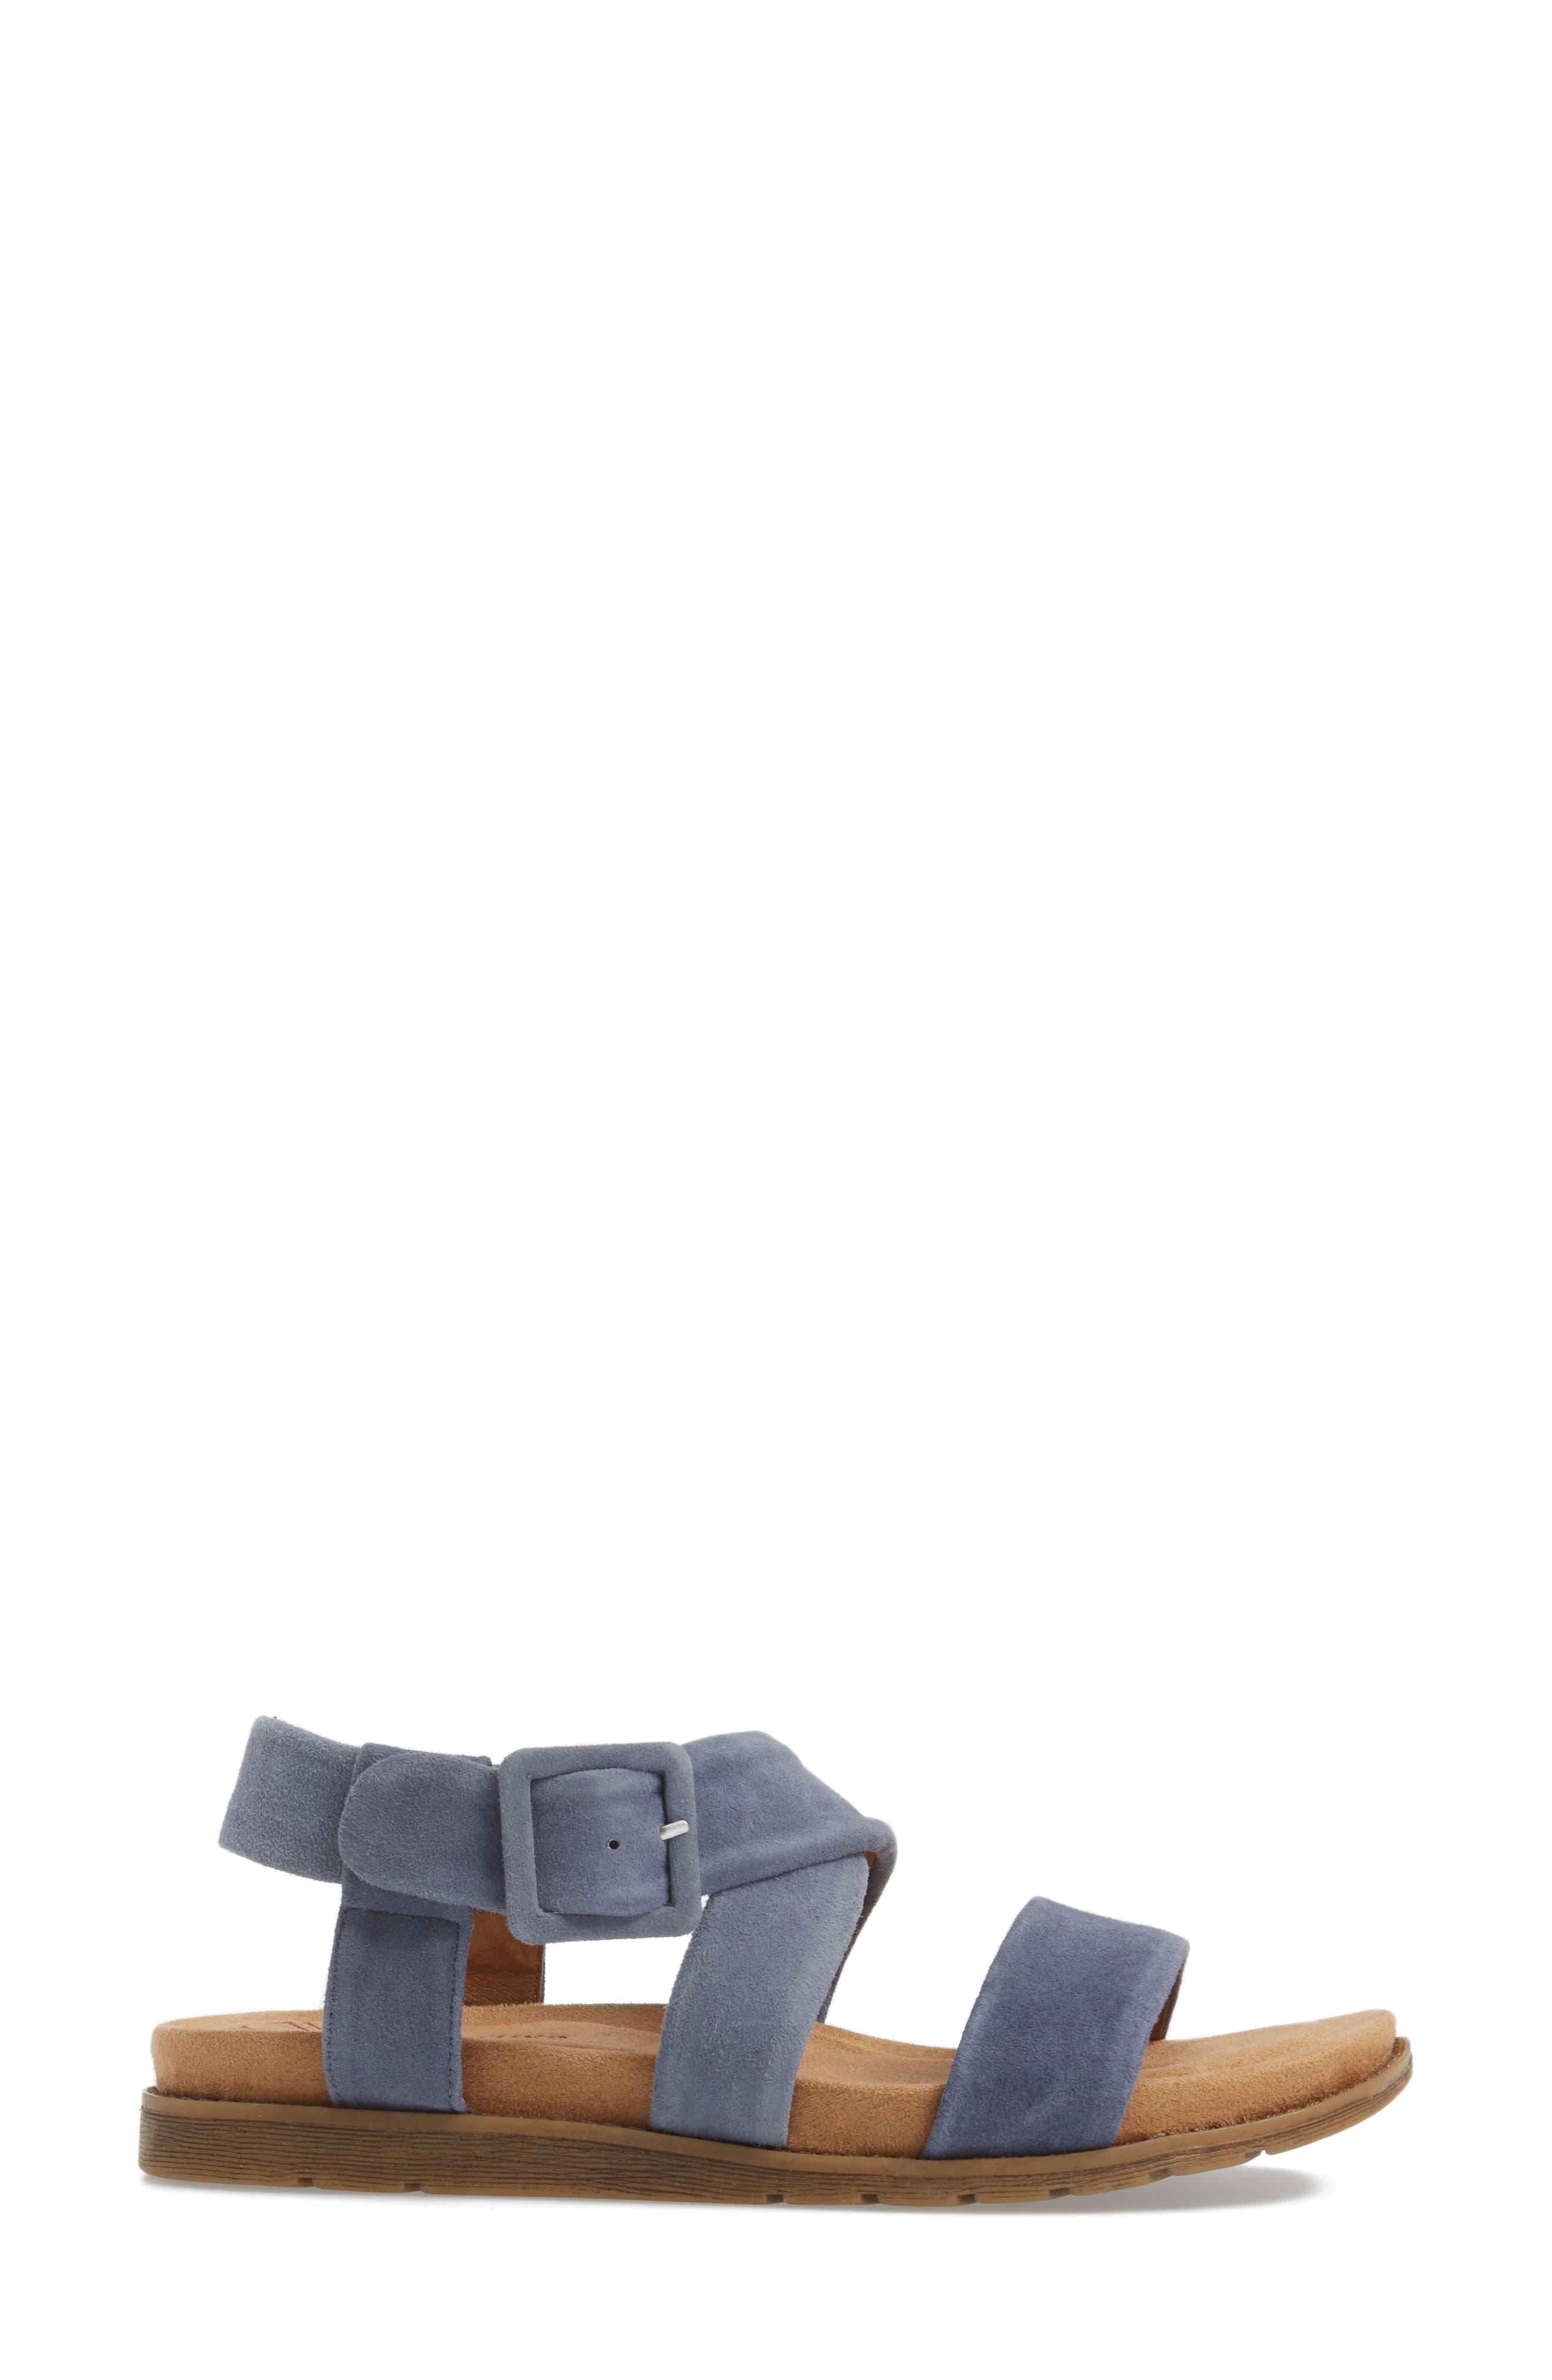 Andria Sandal,                             Alternate thumbnail 3, color,                             420